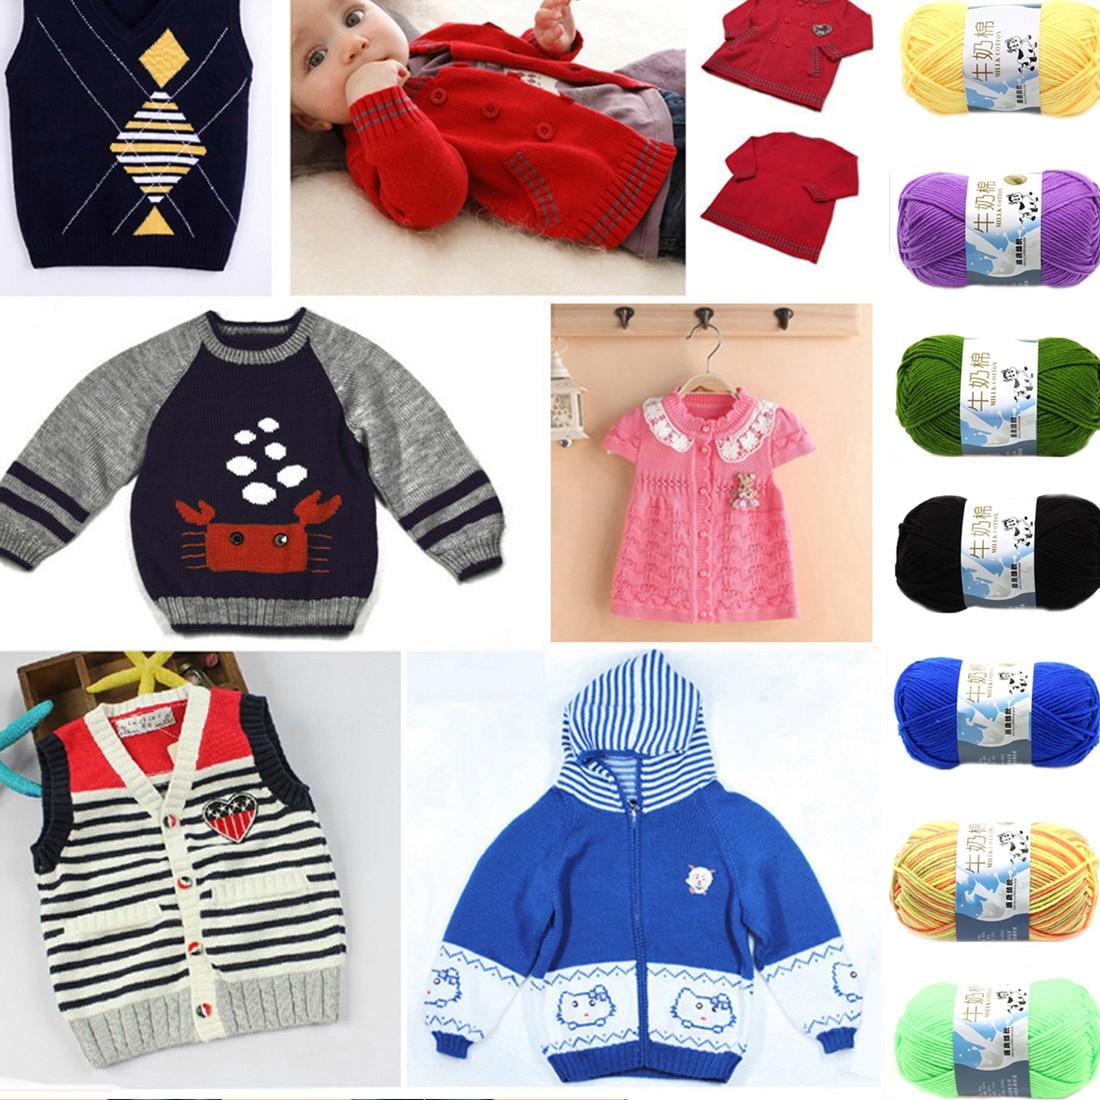 Kreatif Diy Benang Katun Susu Bayi Wol Untuk Merajut Anak Tas Pria D 300 Bmw Merah Biru Laptop Bly 394 Tangan Rajutan Selimut